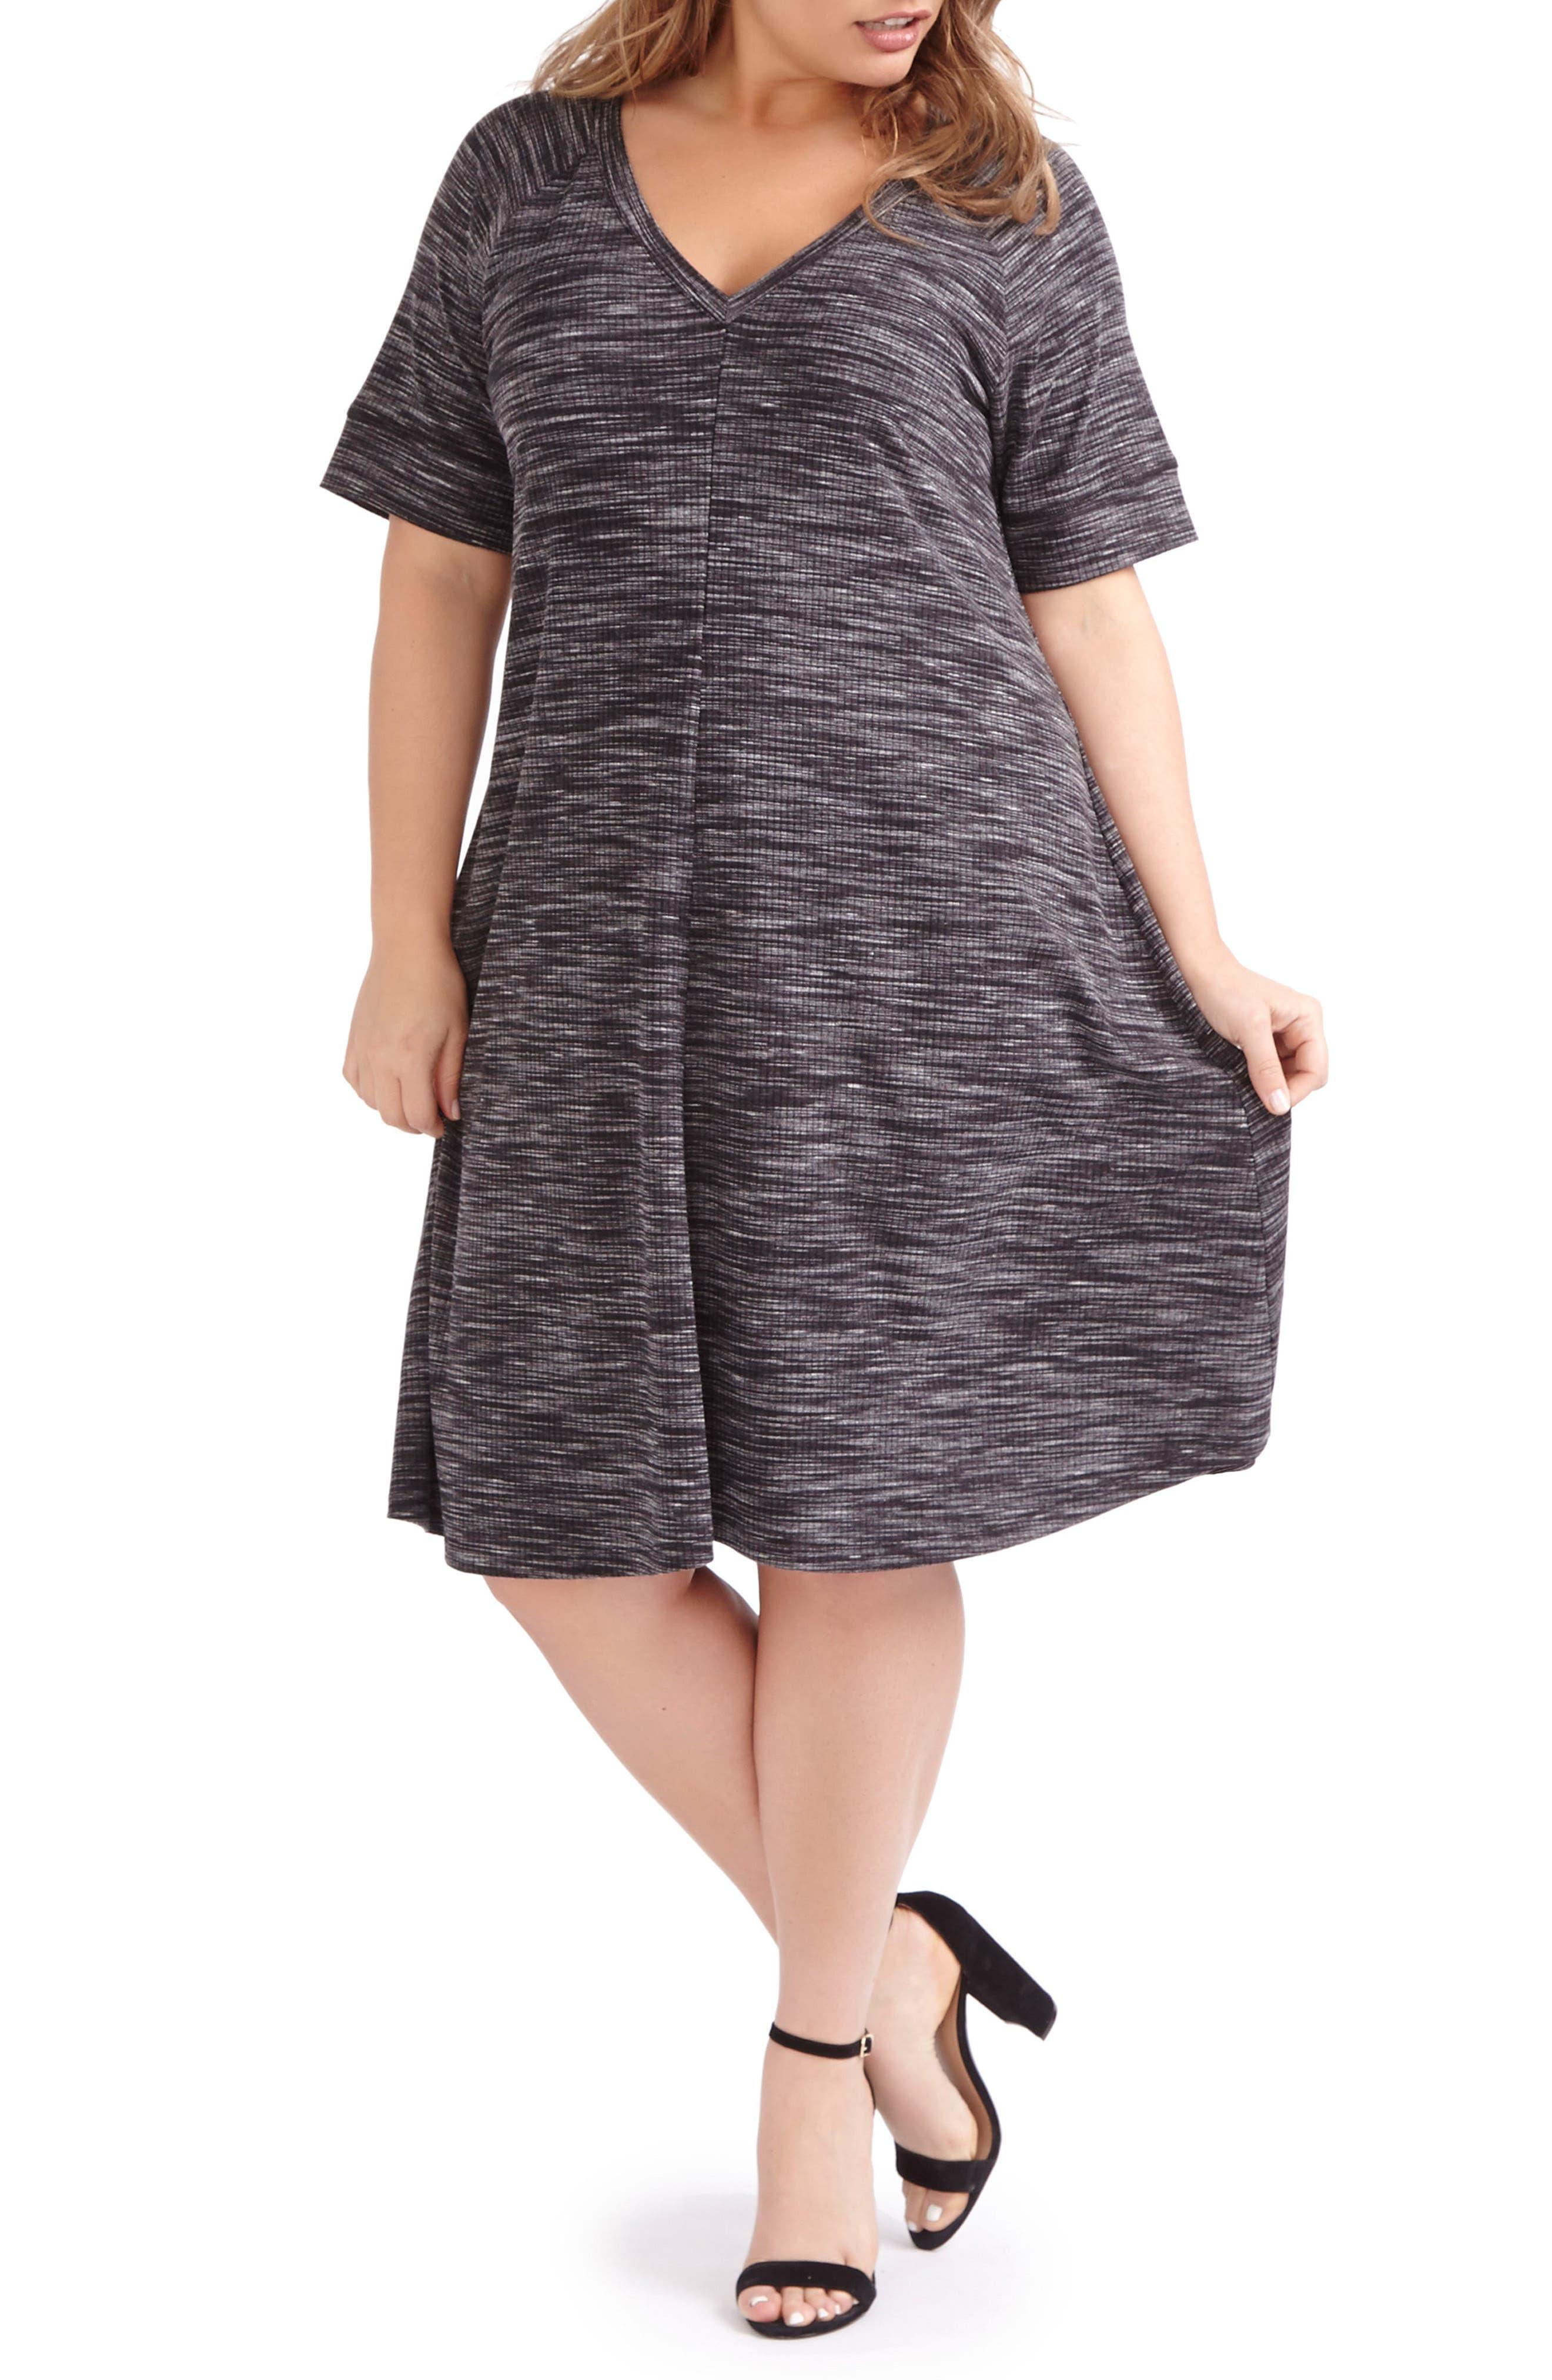 ADDITION ELLE LOVE AND LEGEND Print Rib Knit A-Line Dress (Plus Size)